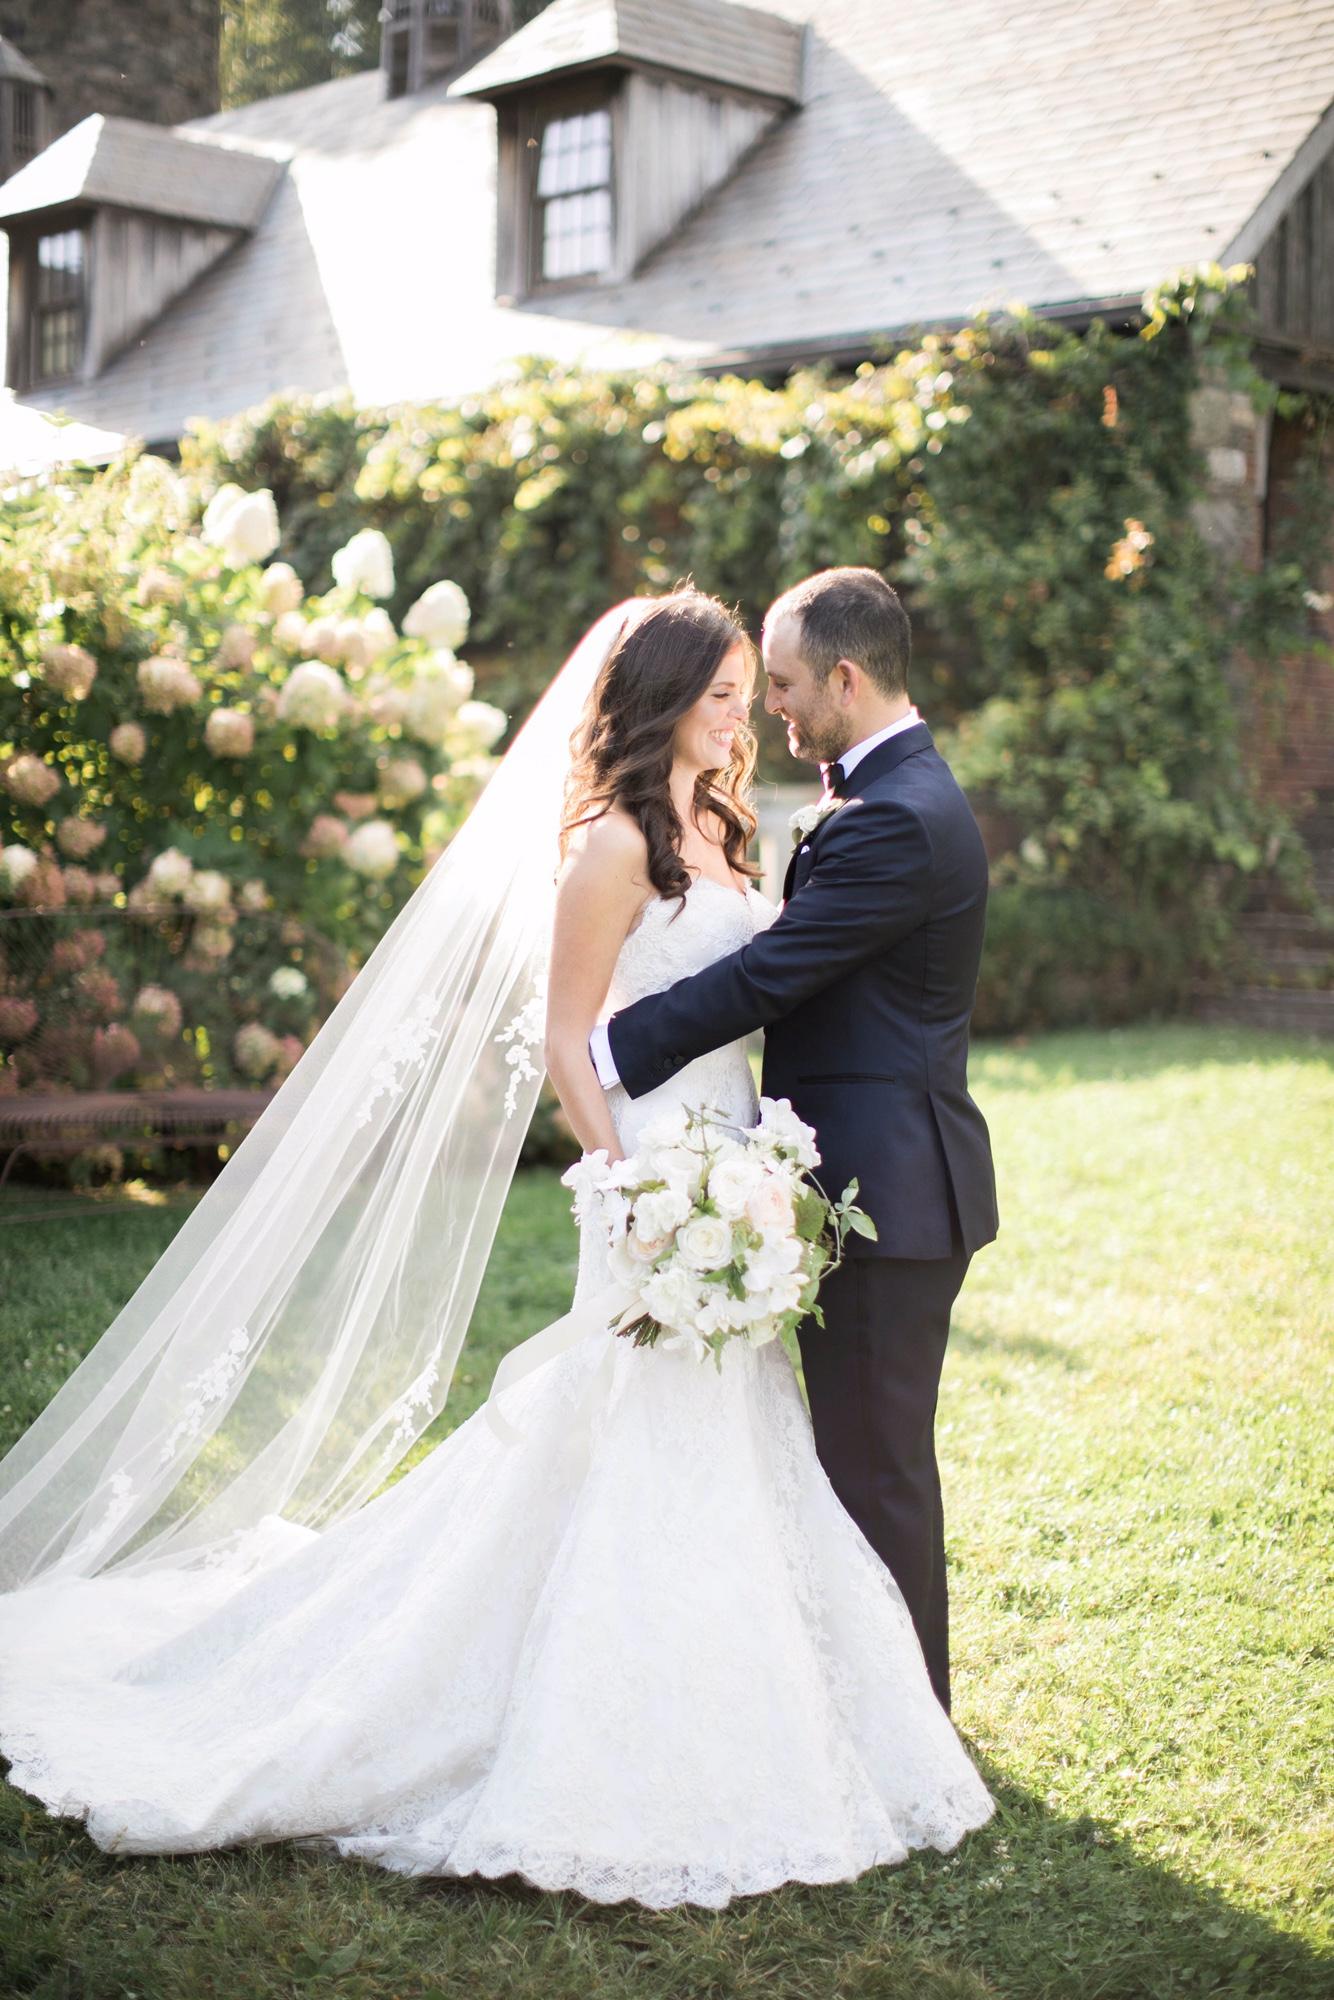 Elegant Affair Wedding at the Farm - Flowers by Denise Fasanello Flowers - Photos by Meg Miller 6.JPG